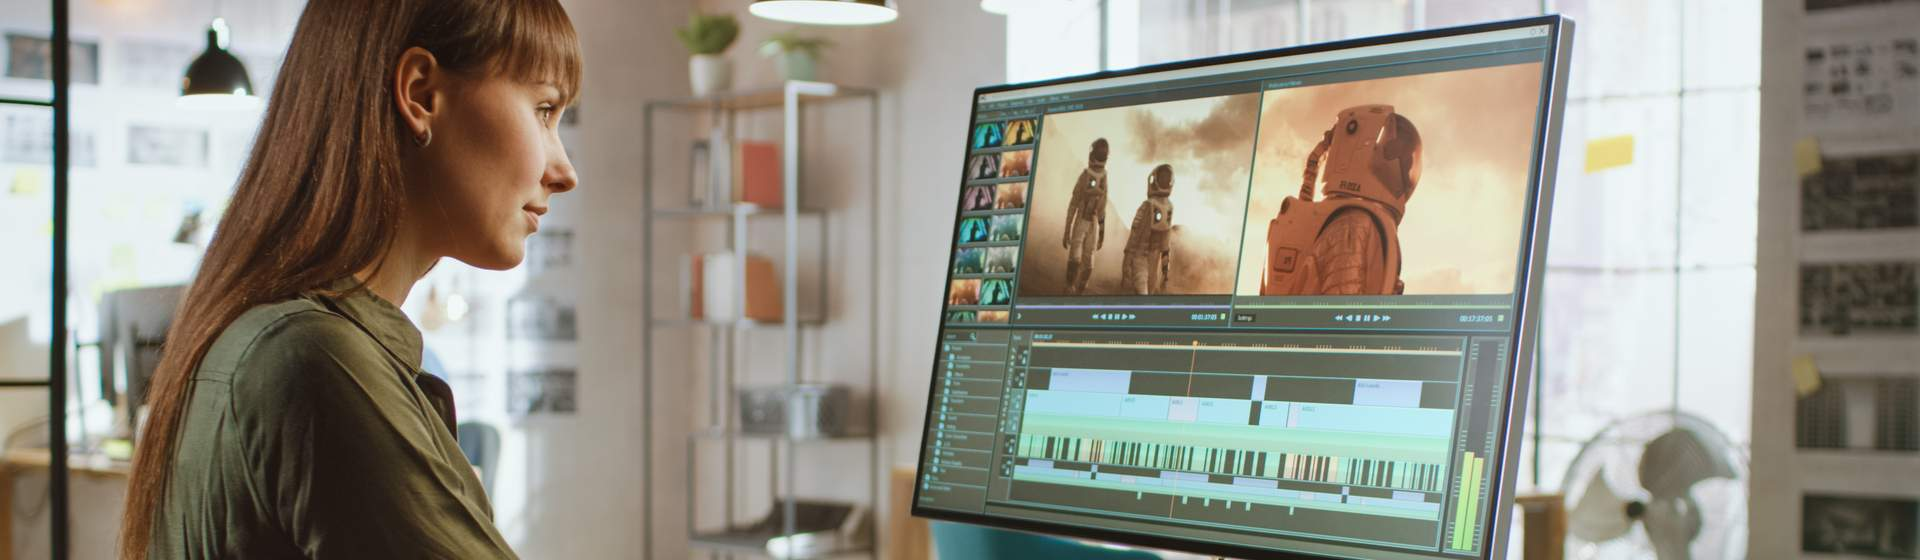 Melhor monitor Full HD em 2021: 9 modelos para comprar